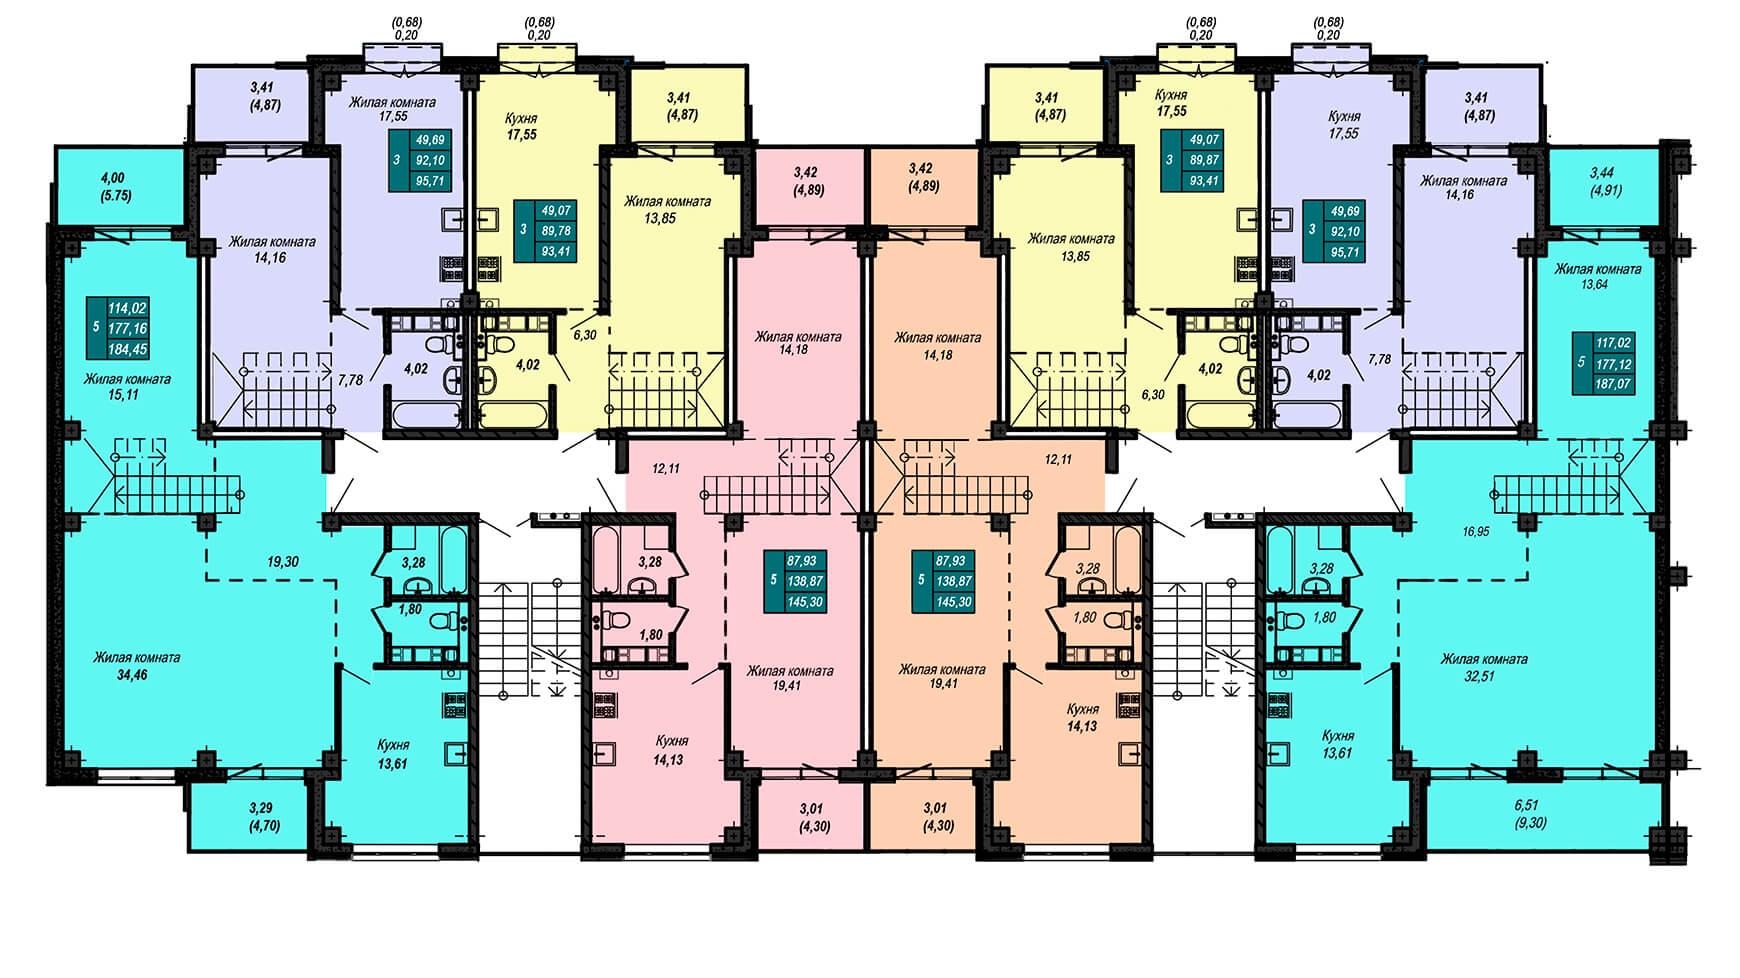 Секция А, 5 этаж + мансарда (двухэтажные квартиры)